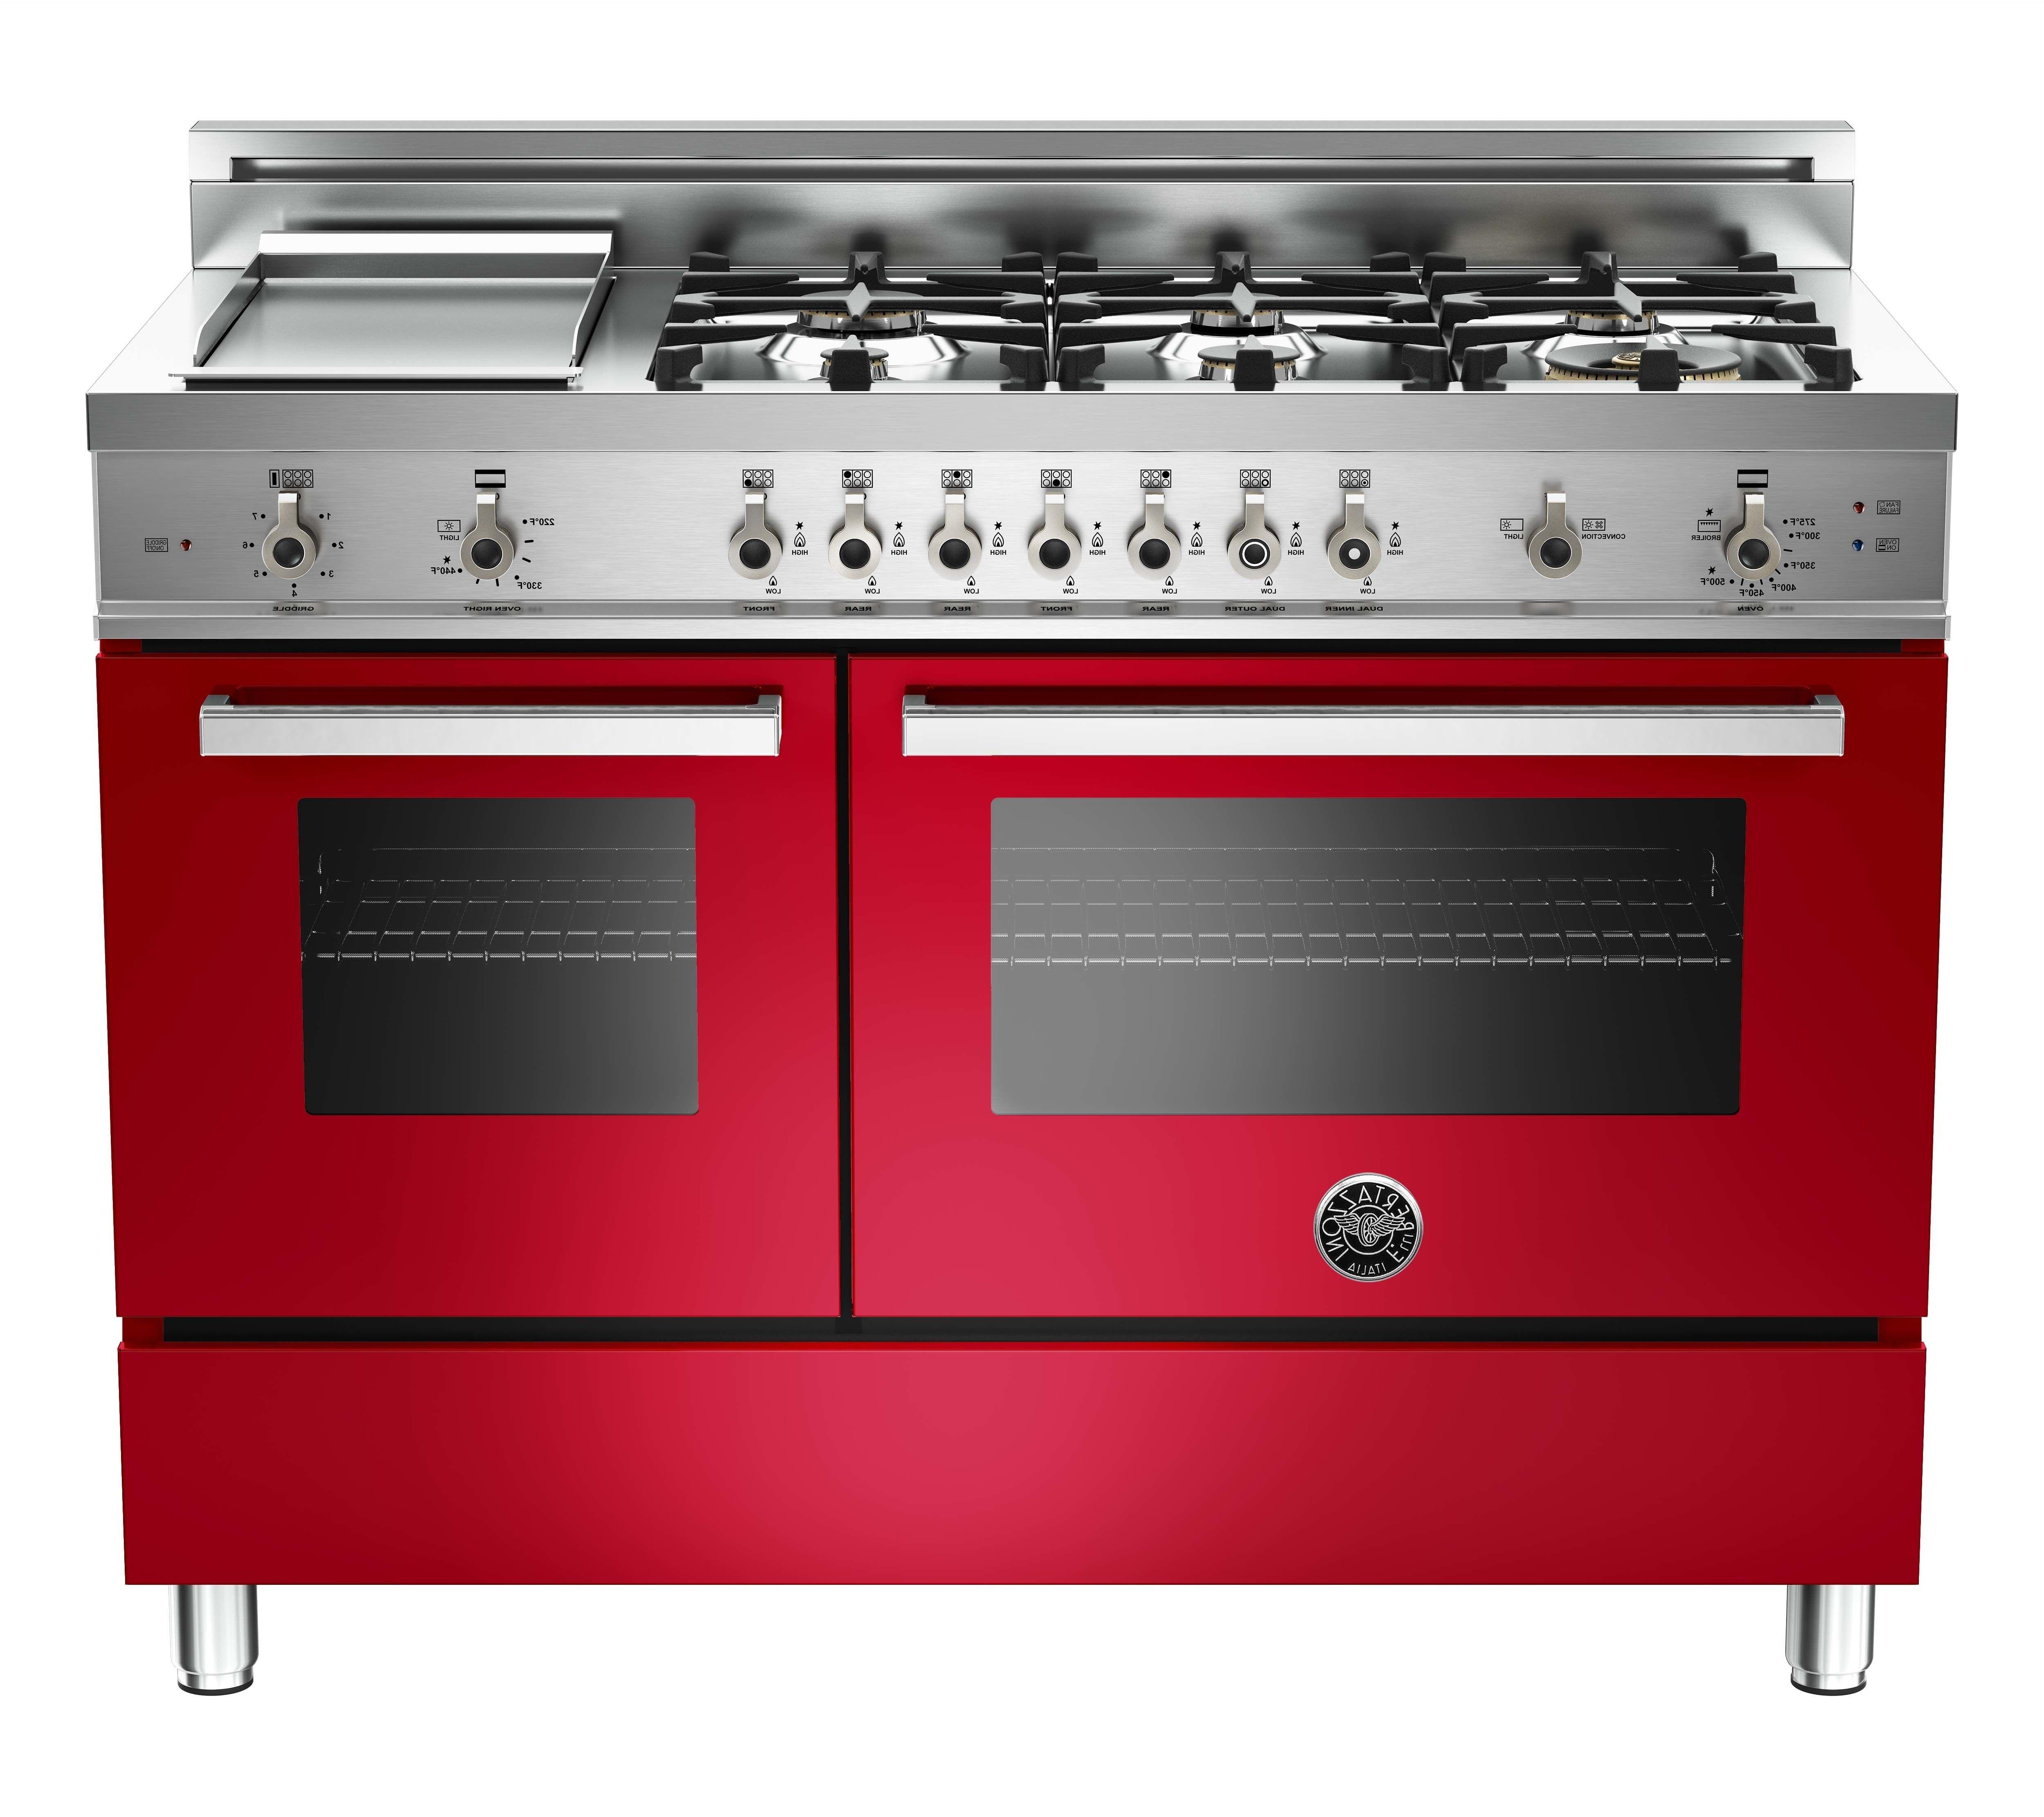 best luxury appliance brands photos architectural digest from